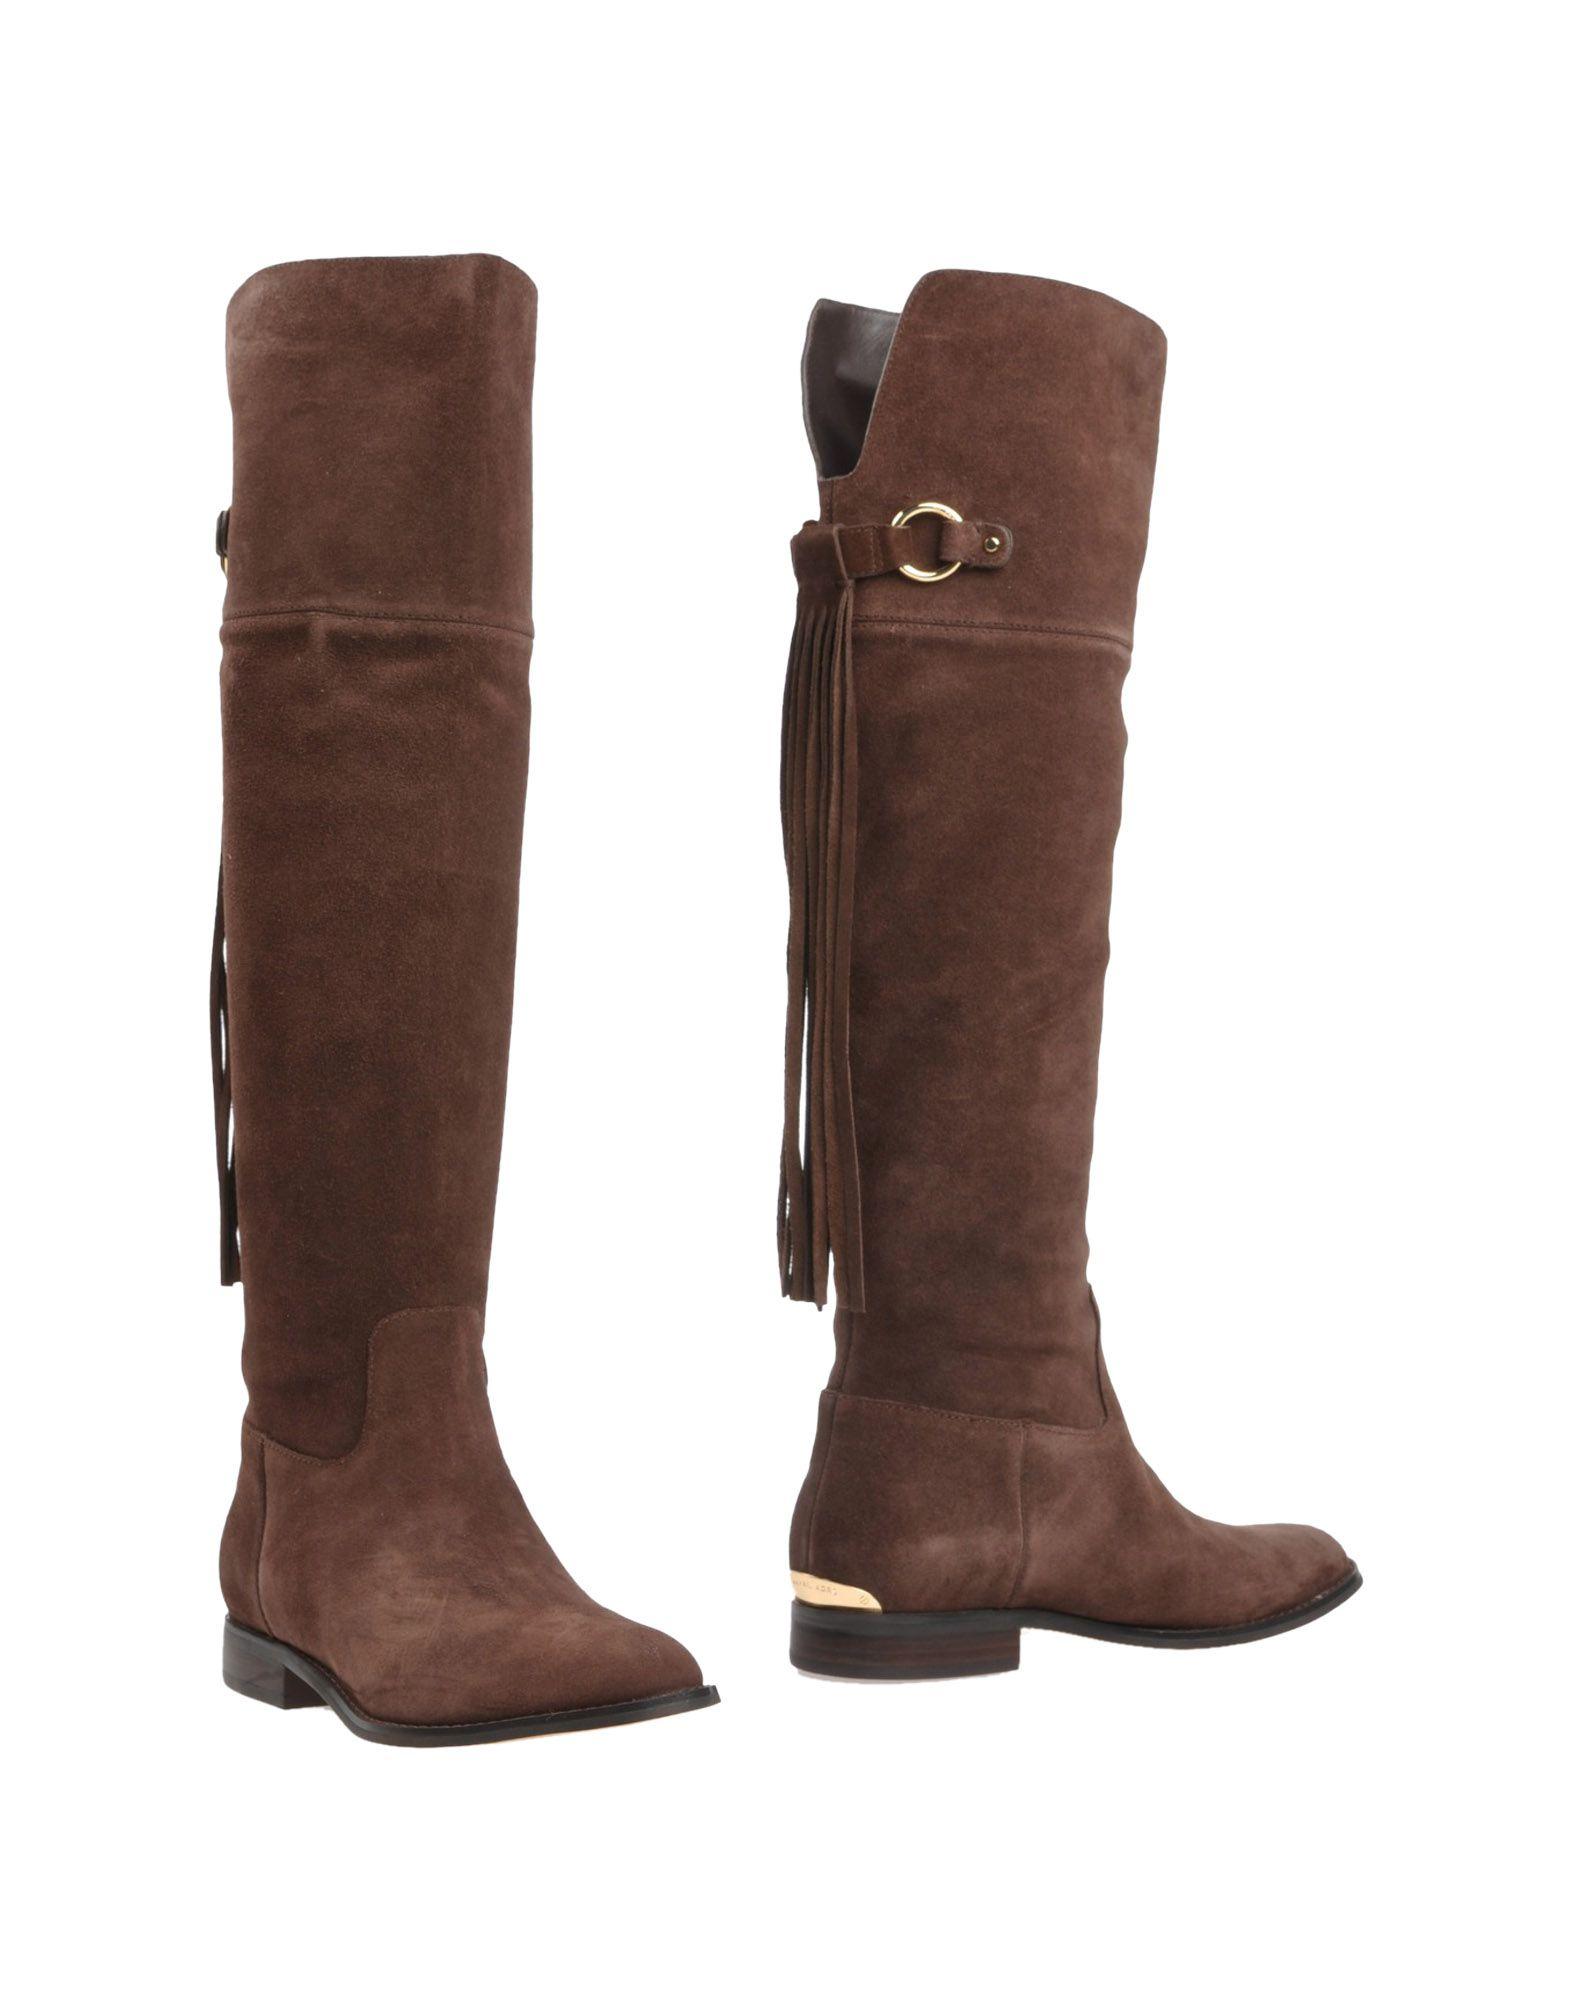 michael michael kors boots in brown brown lyst